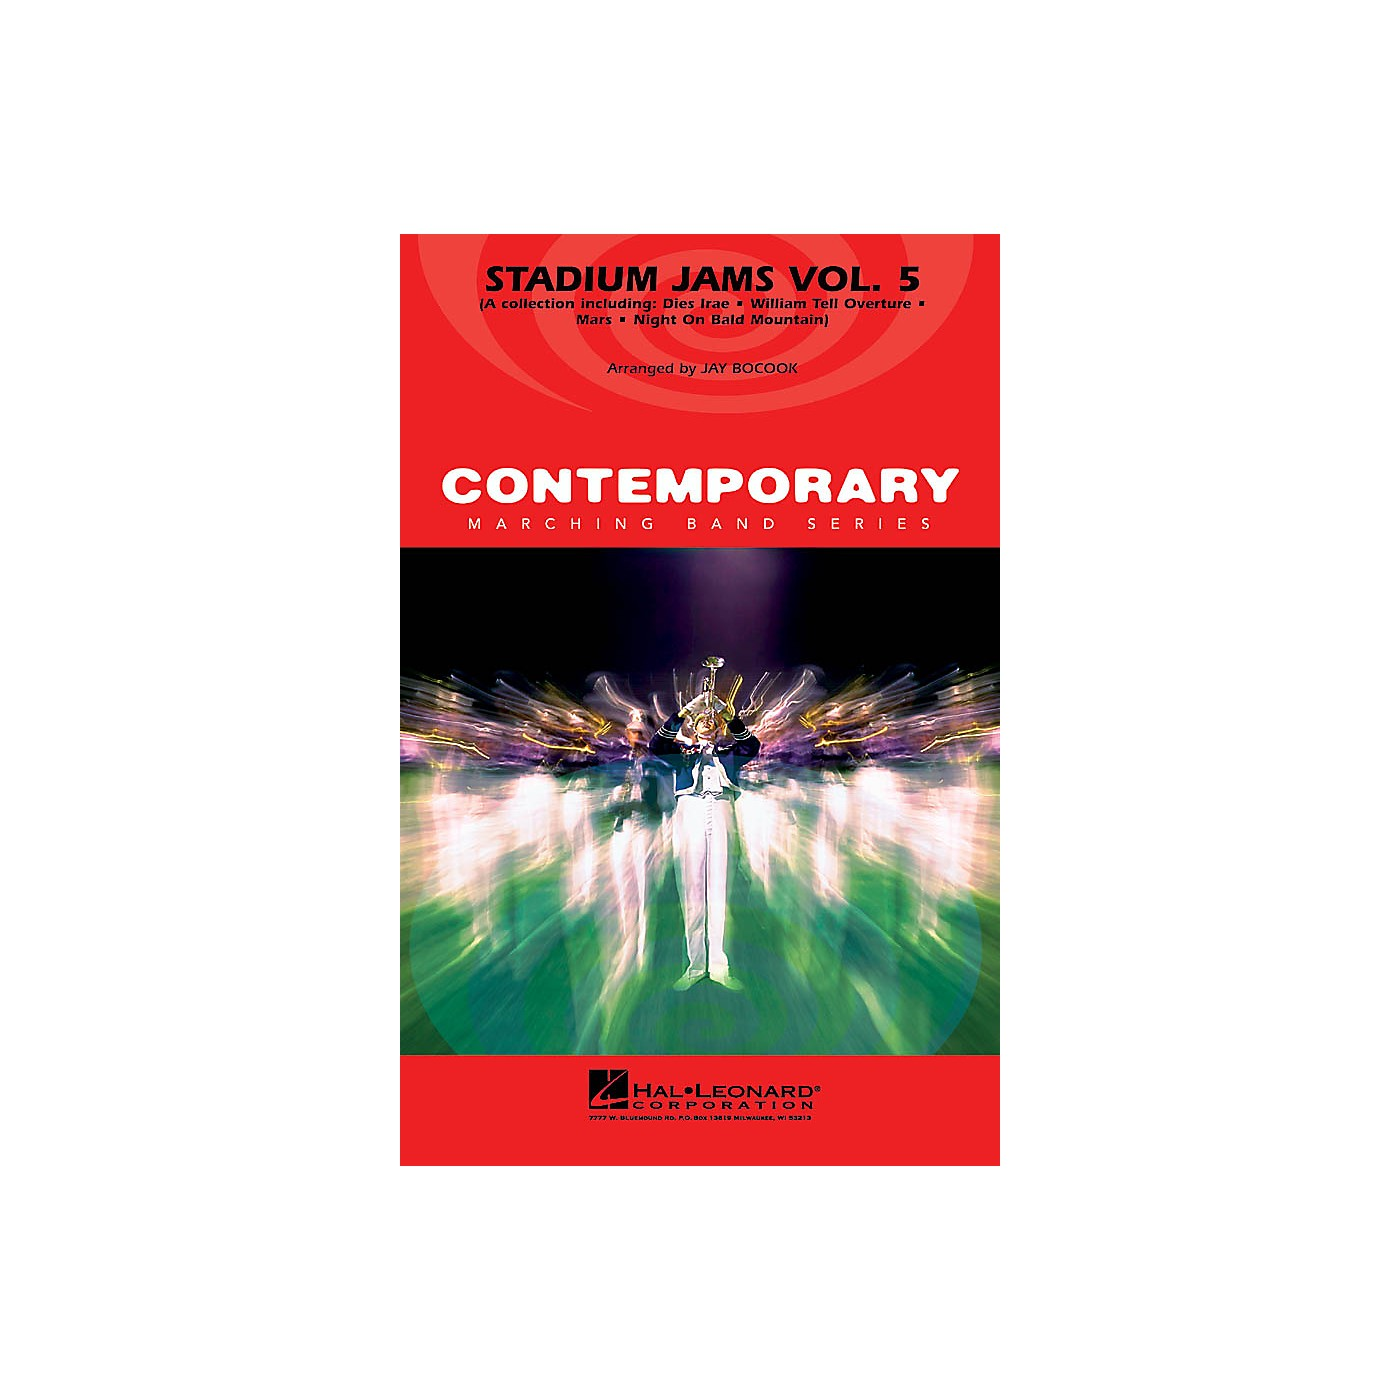 Hal Leonard Stadium Jams - Vol. 5 Marching Band Level 3-4 Arranged by Jay Bocook thumbnail